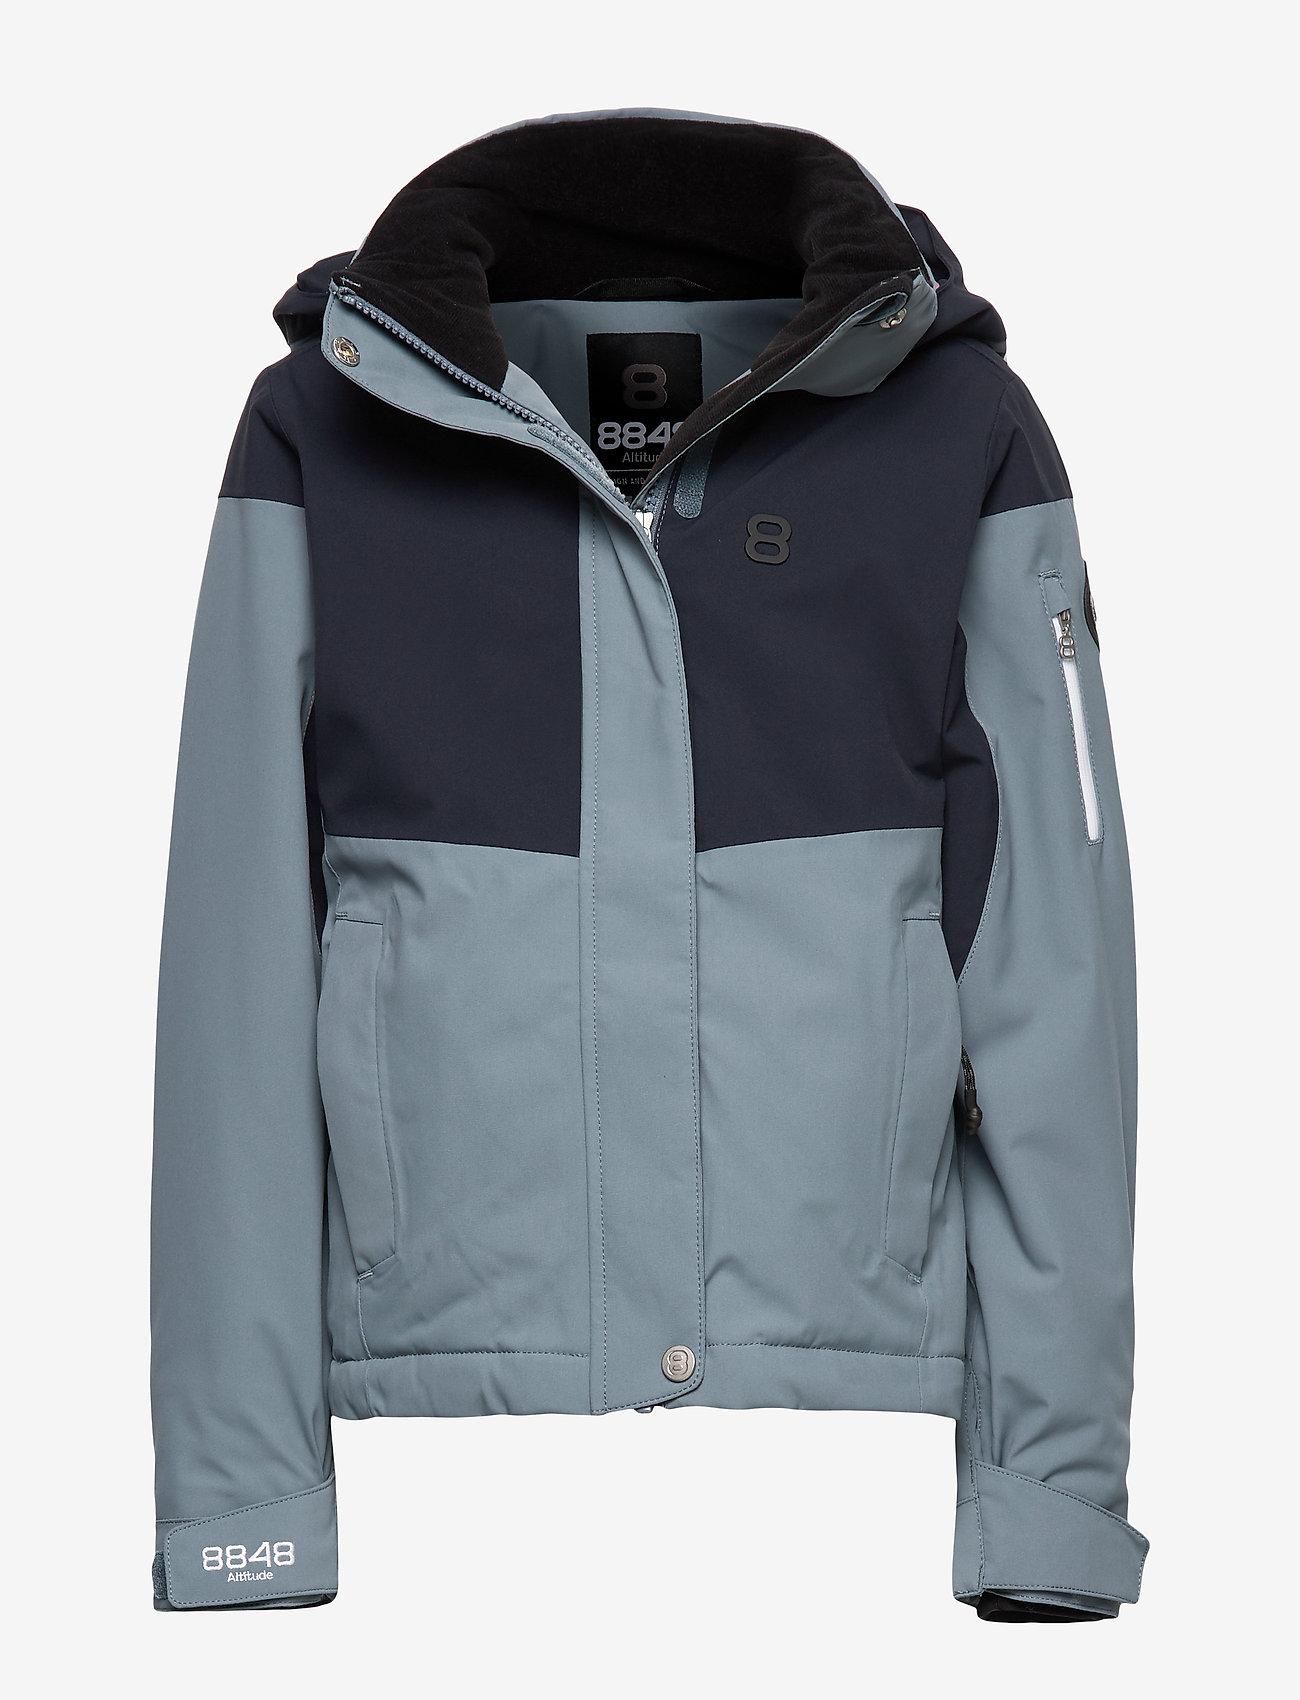 8848 Altitude - Florina JR Jacket - kurtka zimowa - pearl blue - 0